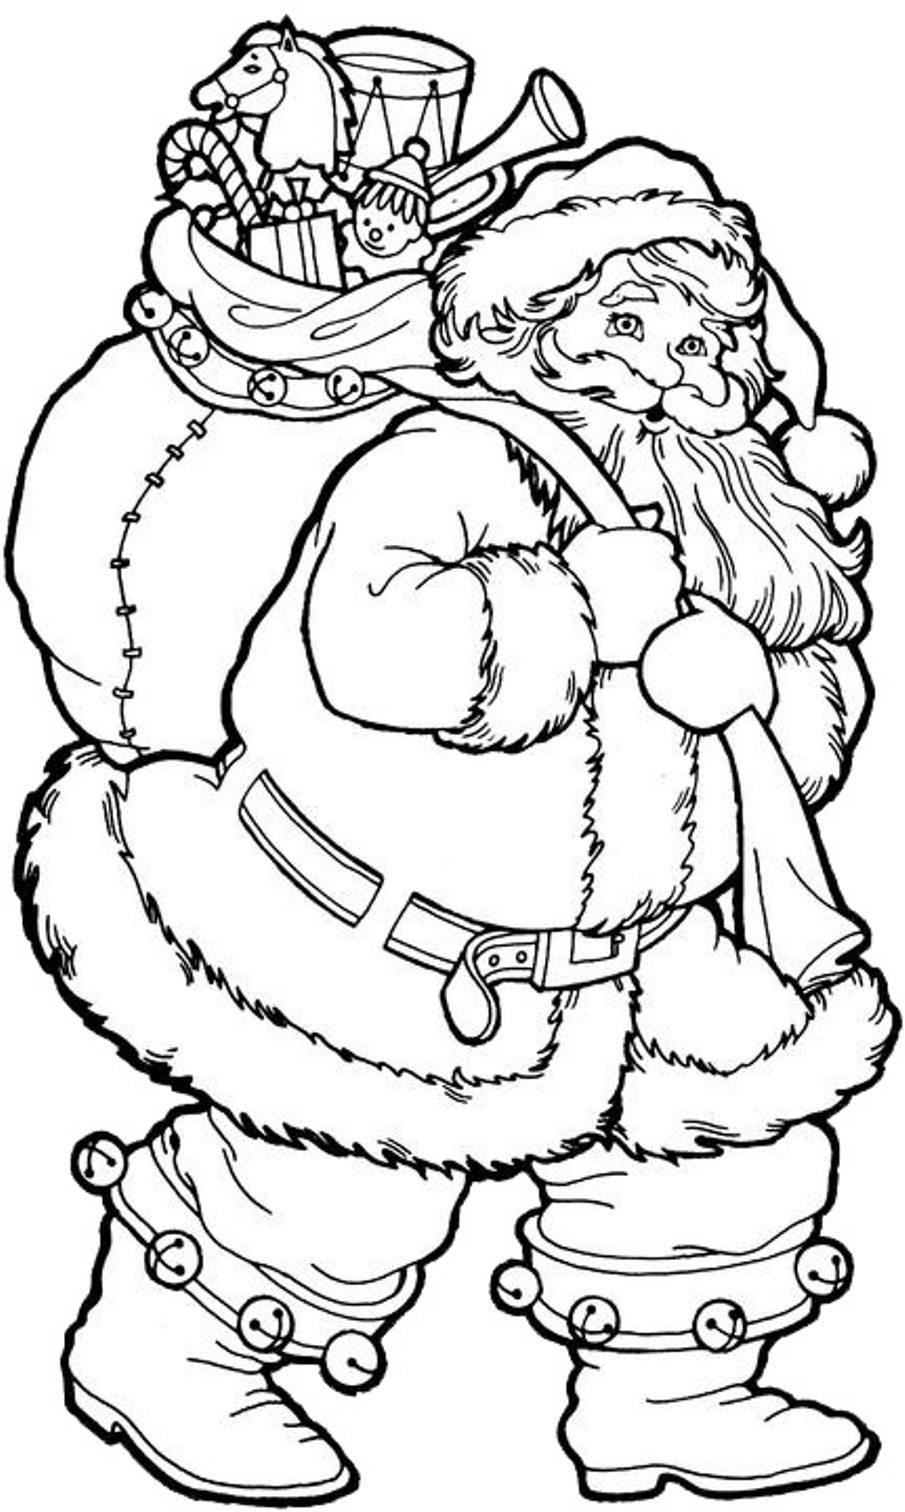 Santa Claus In Sleigh Coloring Page Santa Coloring Pages Coloringrocks